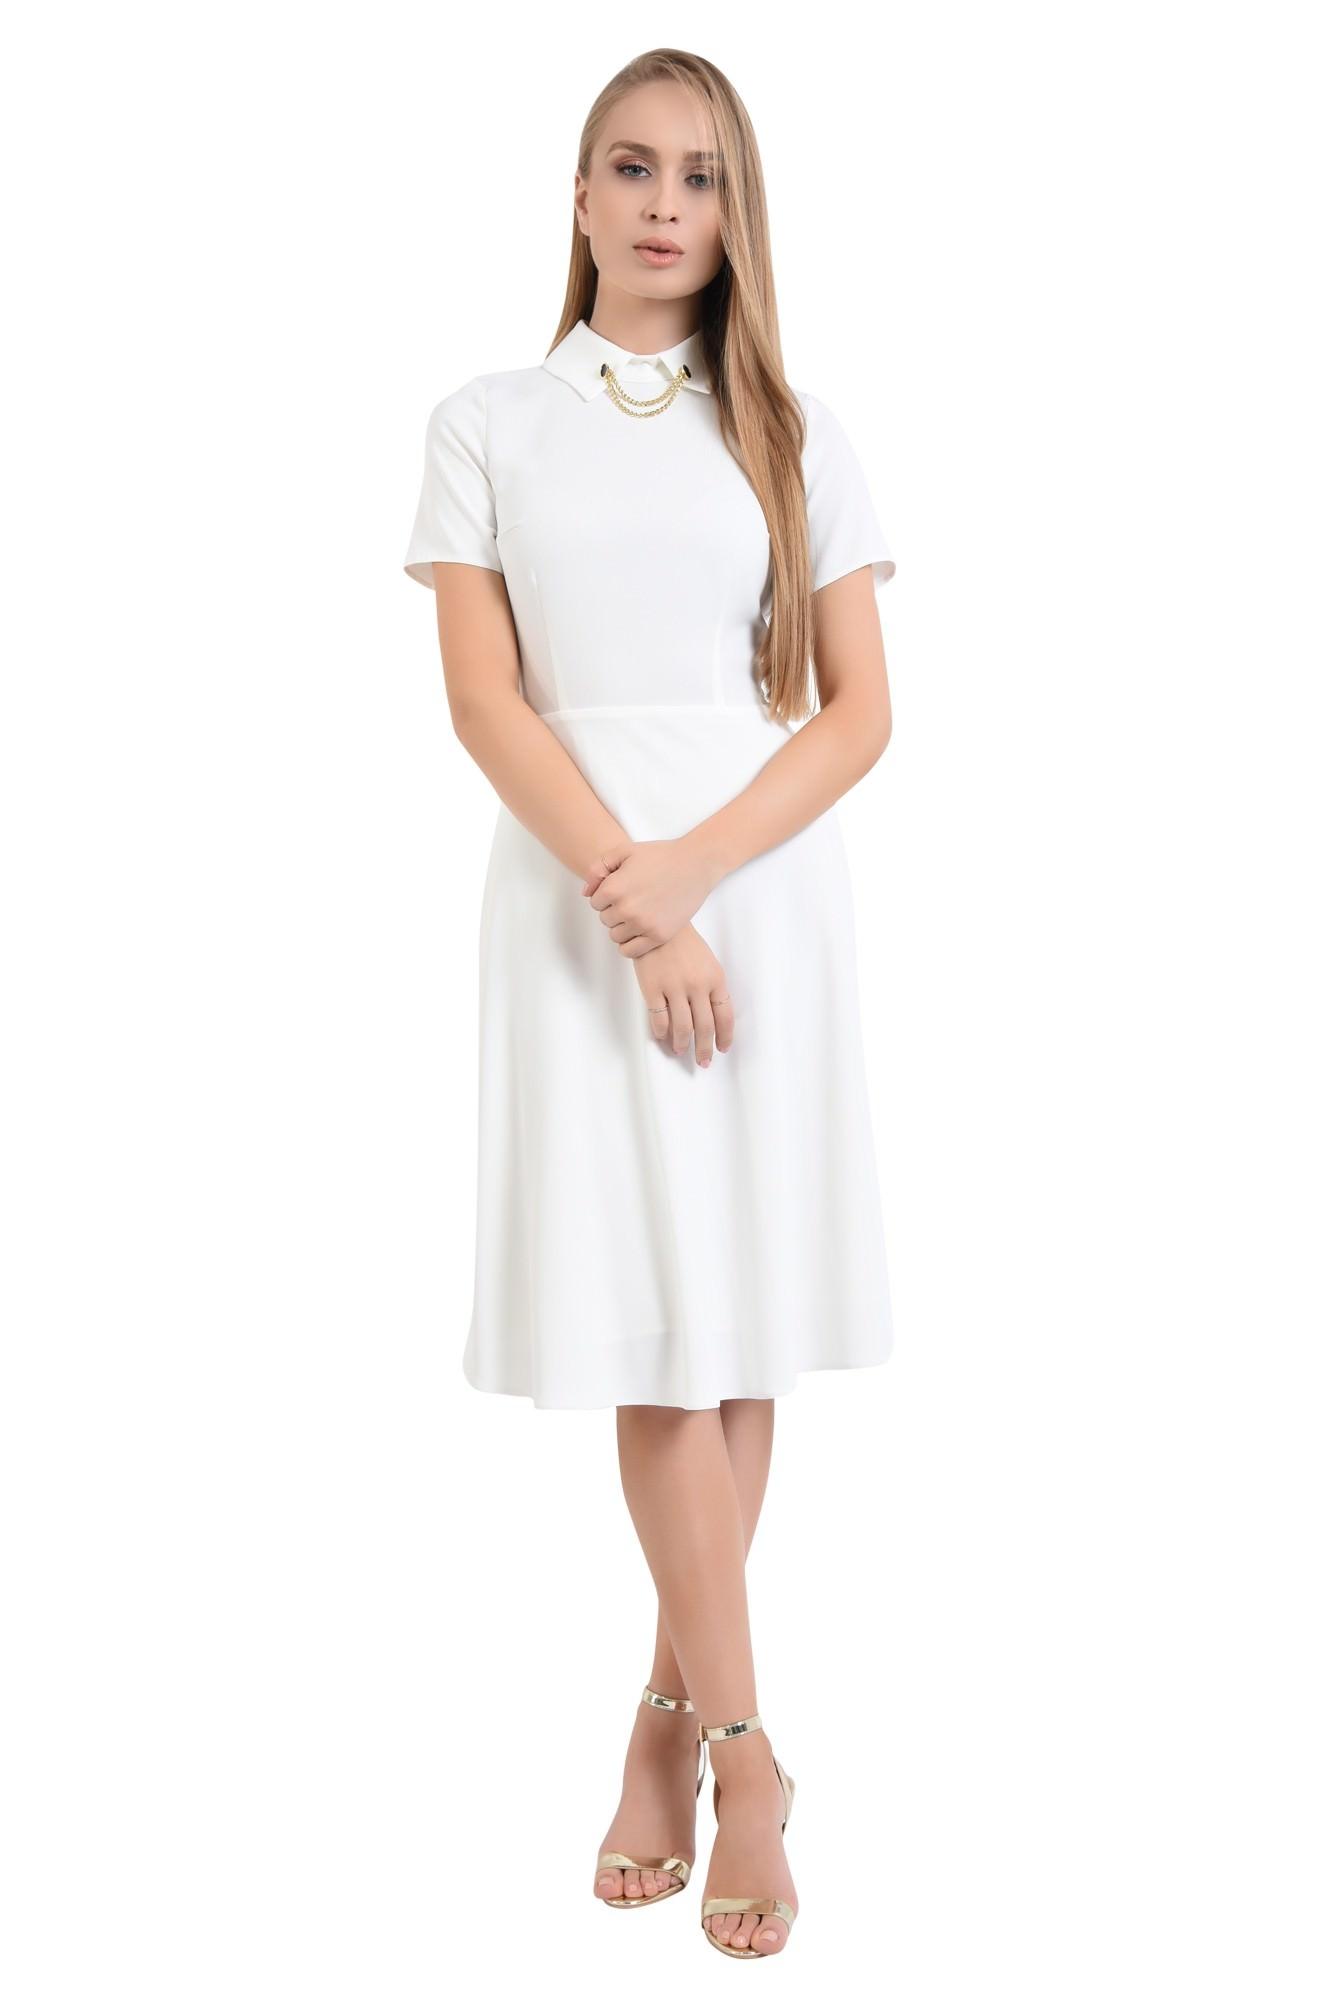 3 - 360 - rochie alba eleganta, bie, lungime medie